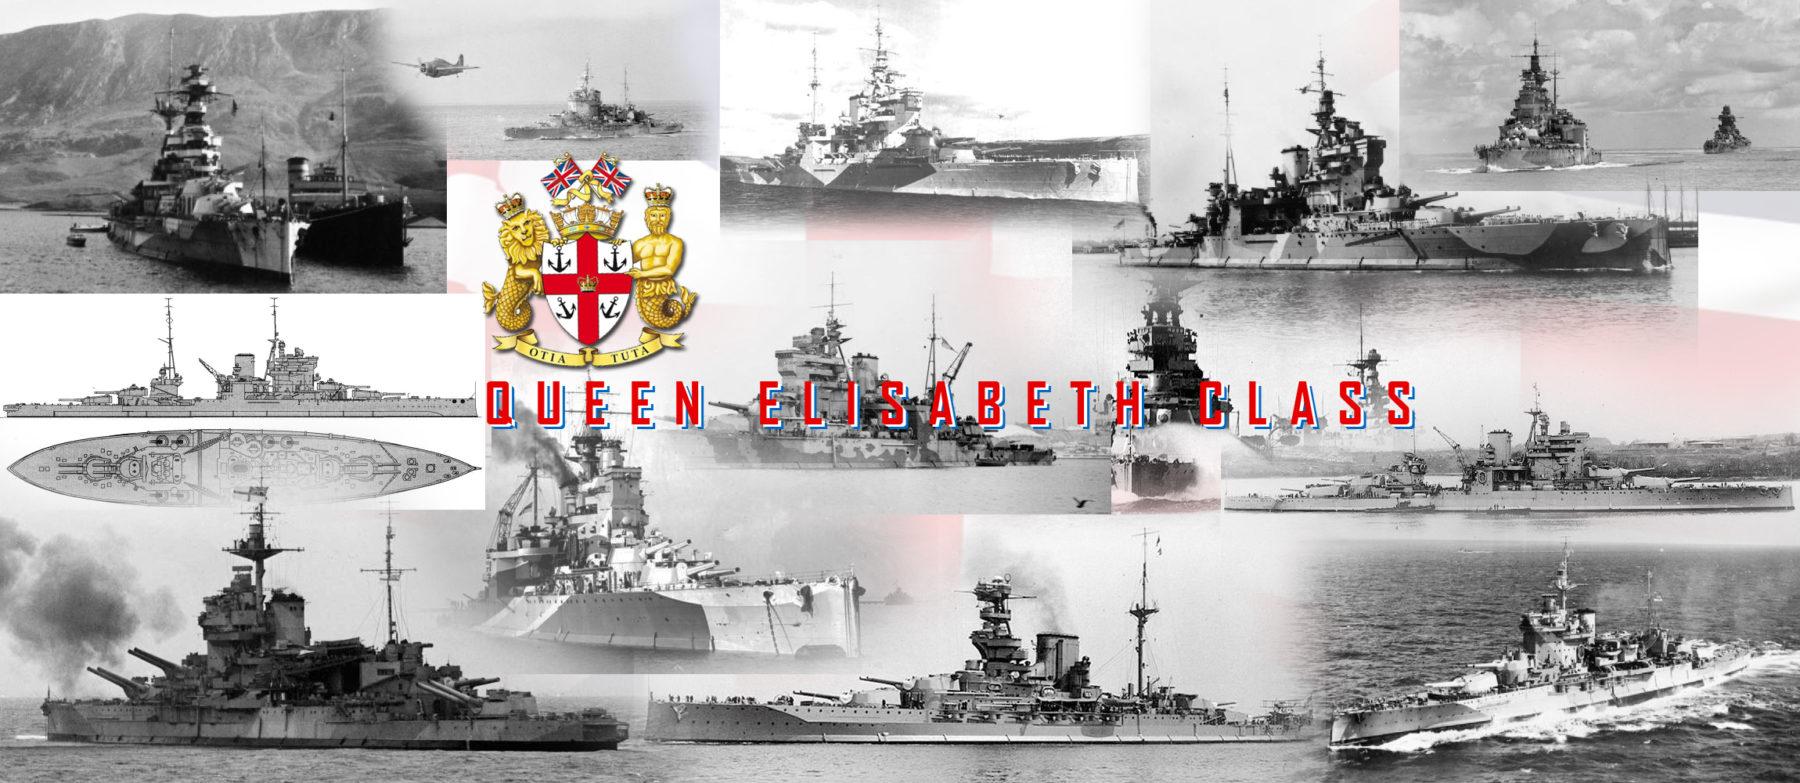 Queen Elizabeth class Battleships (1913)